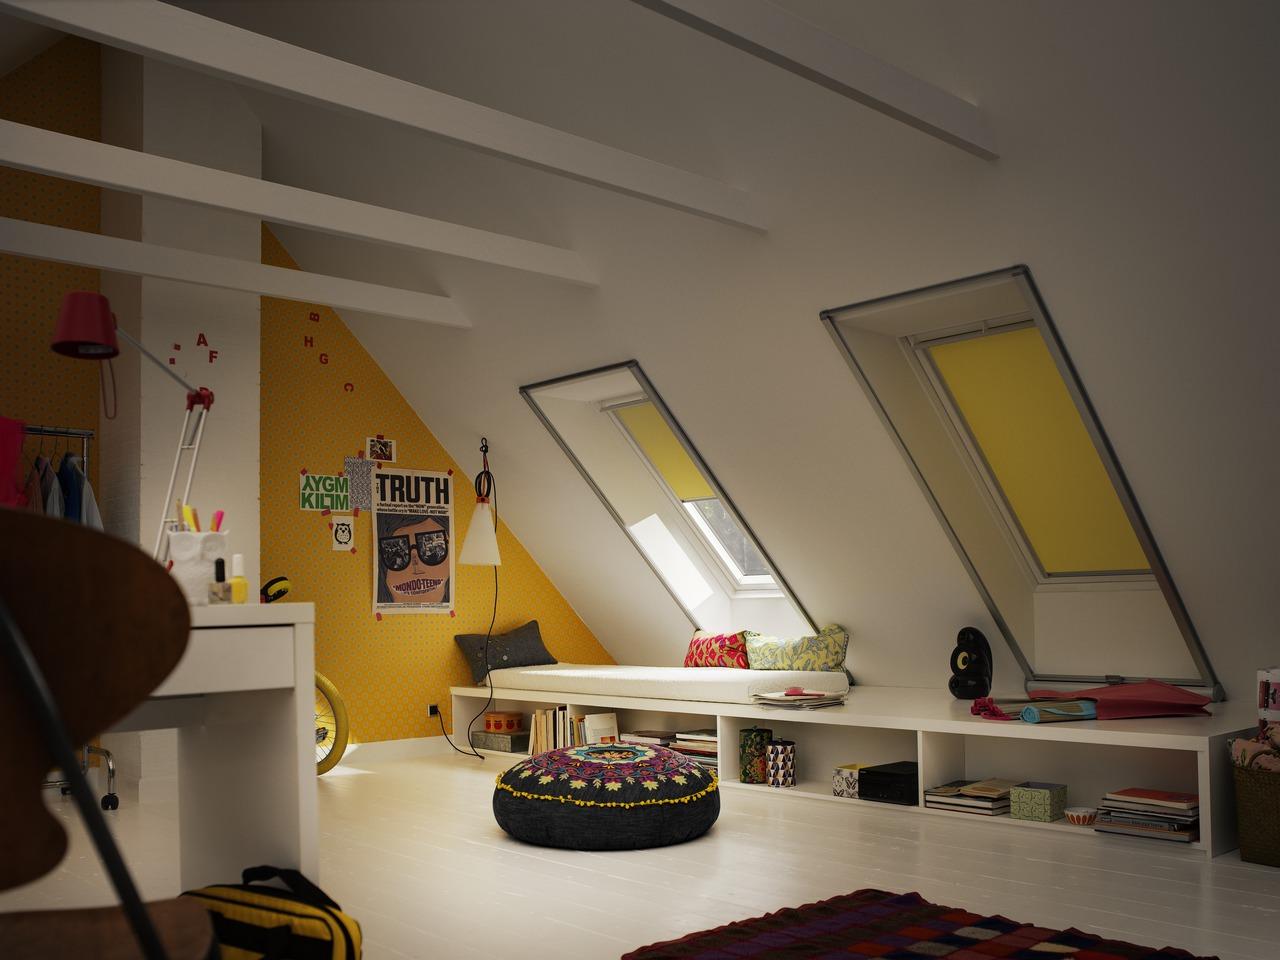 Pareti Verdi Per Camerette: Idee su pareti a righe temi per camera da. Ed infine il bianco ...